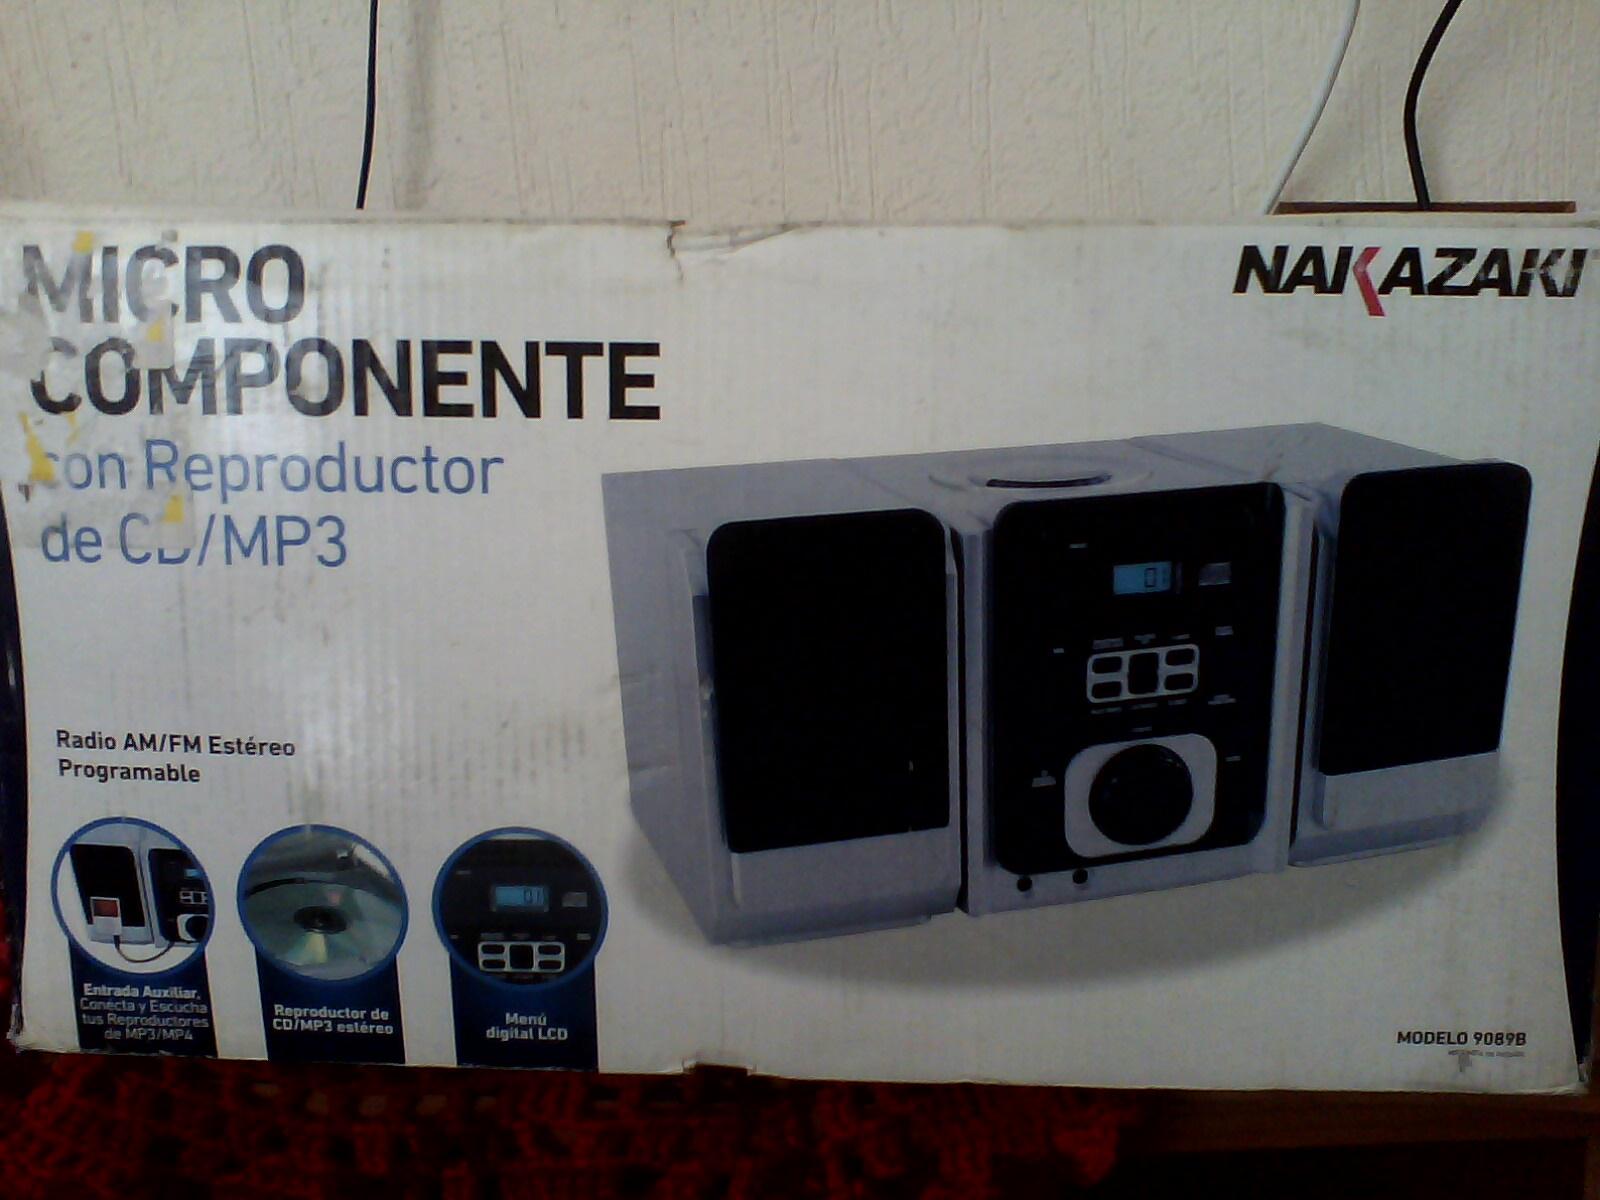 Bodega Aurrerá: Micro Componente CD/MP3 y Auxiliar Marca Nakazaki en $71.04